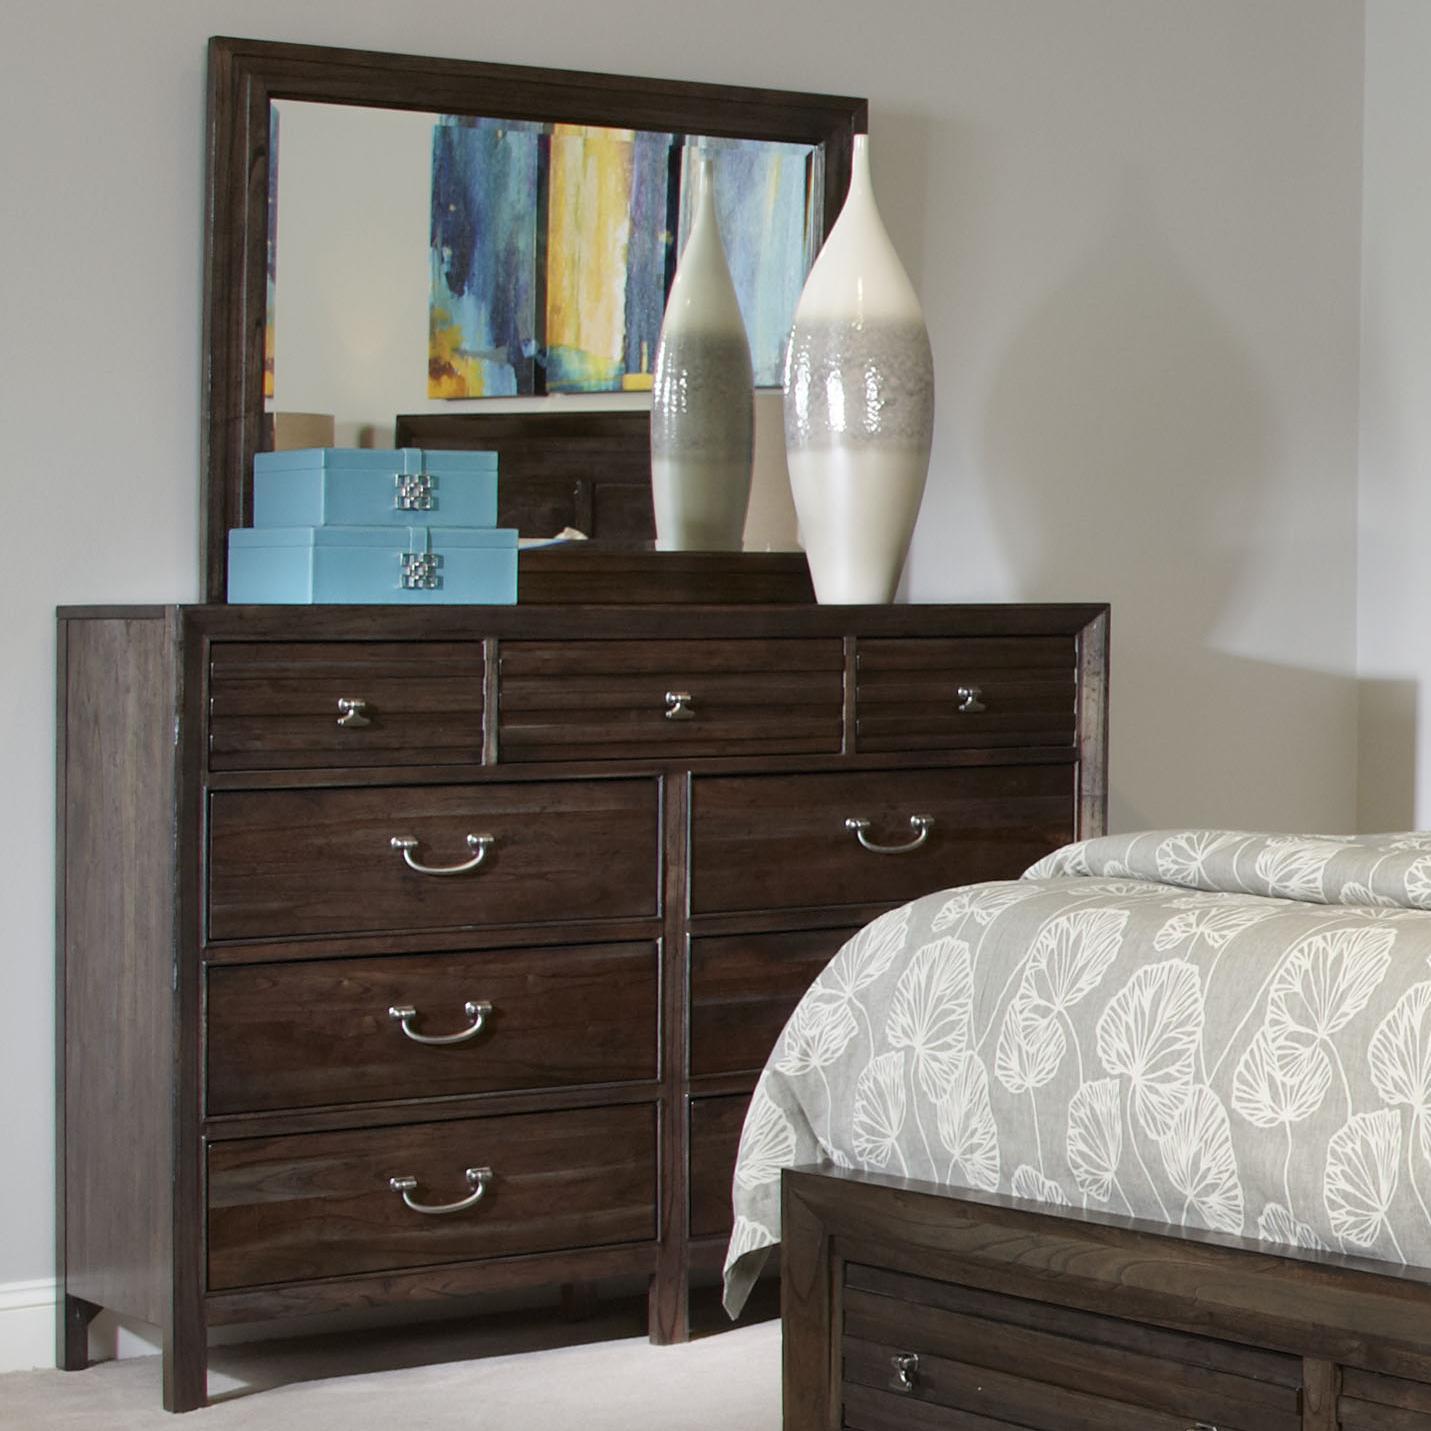 Kincaid Furniture Montreat Bureau & Mirror - Item Number: 84-161+118